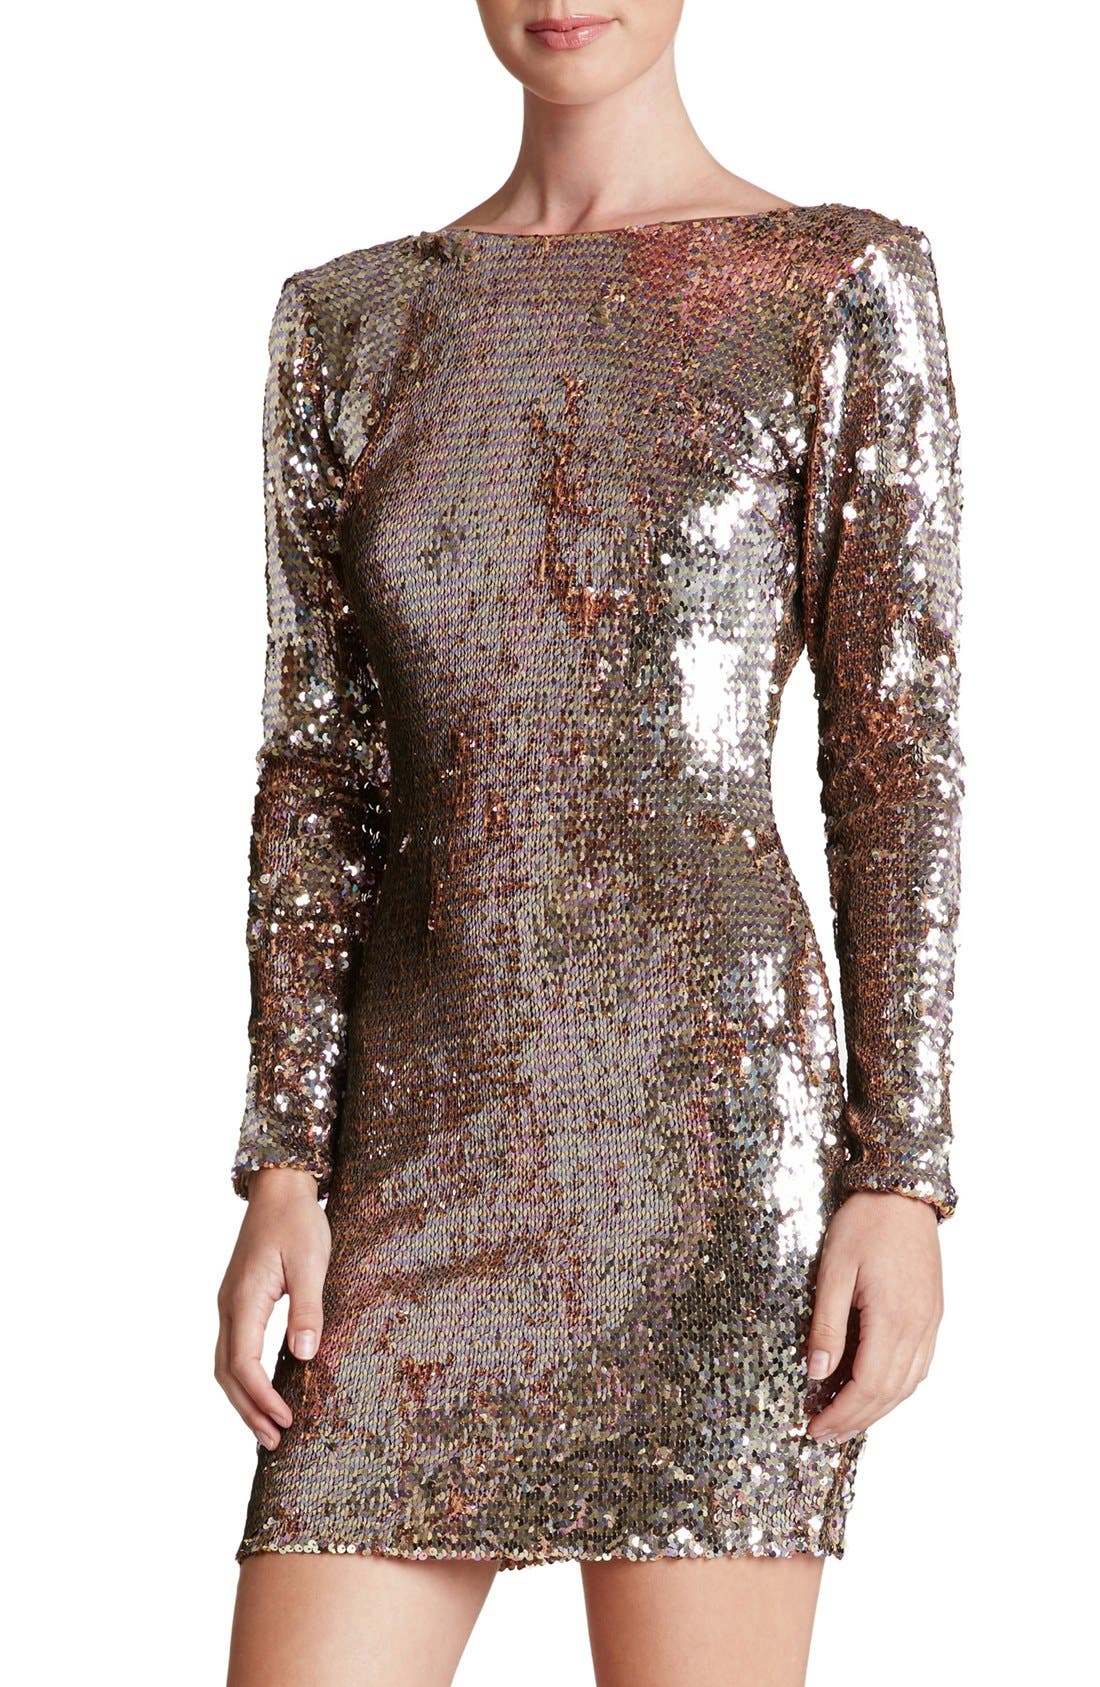 Alternate Image 1 Selected - Dress the Population 'Lola' Backless Sequin Minidress